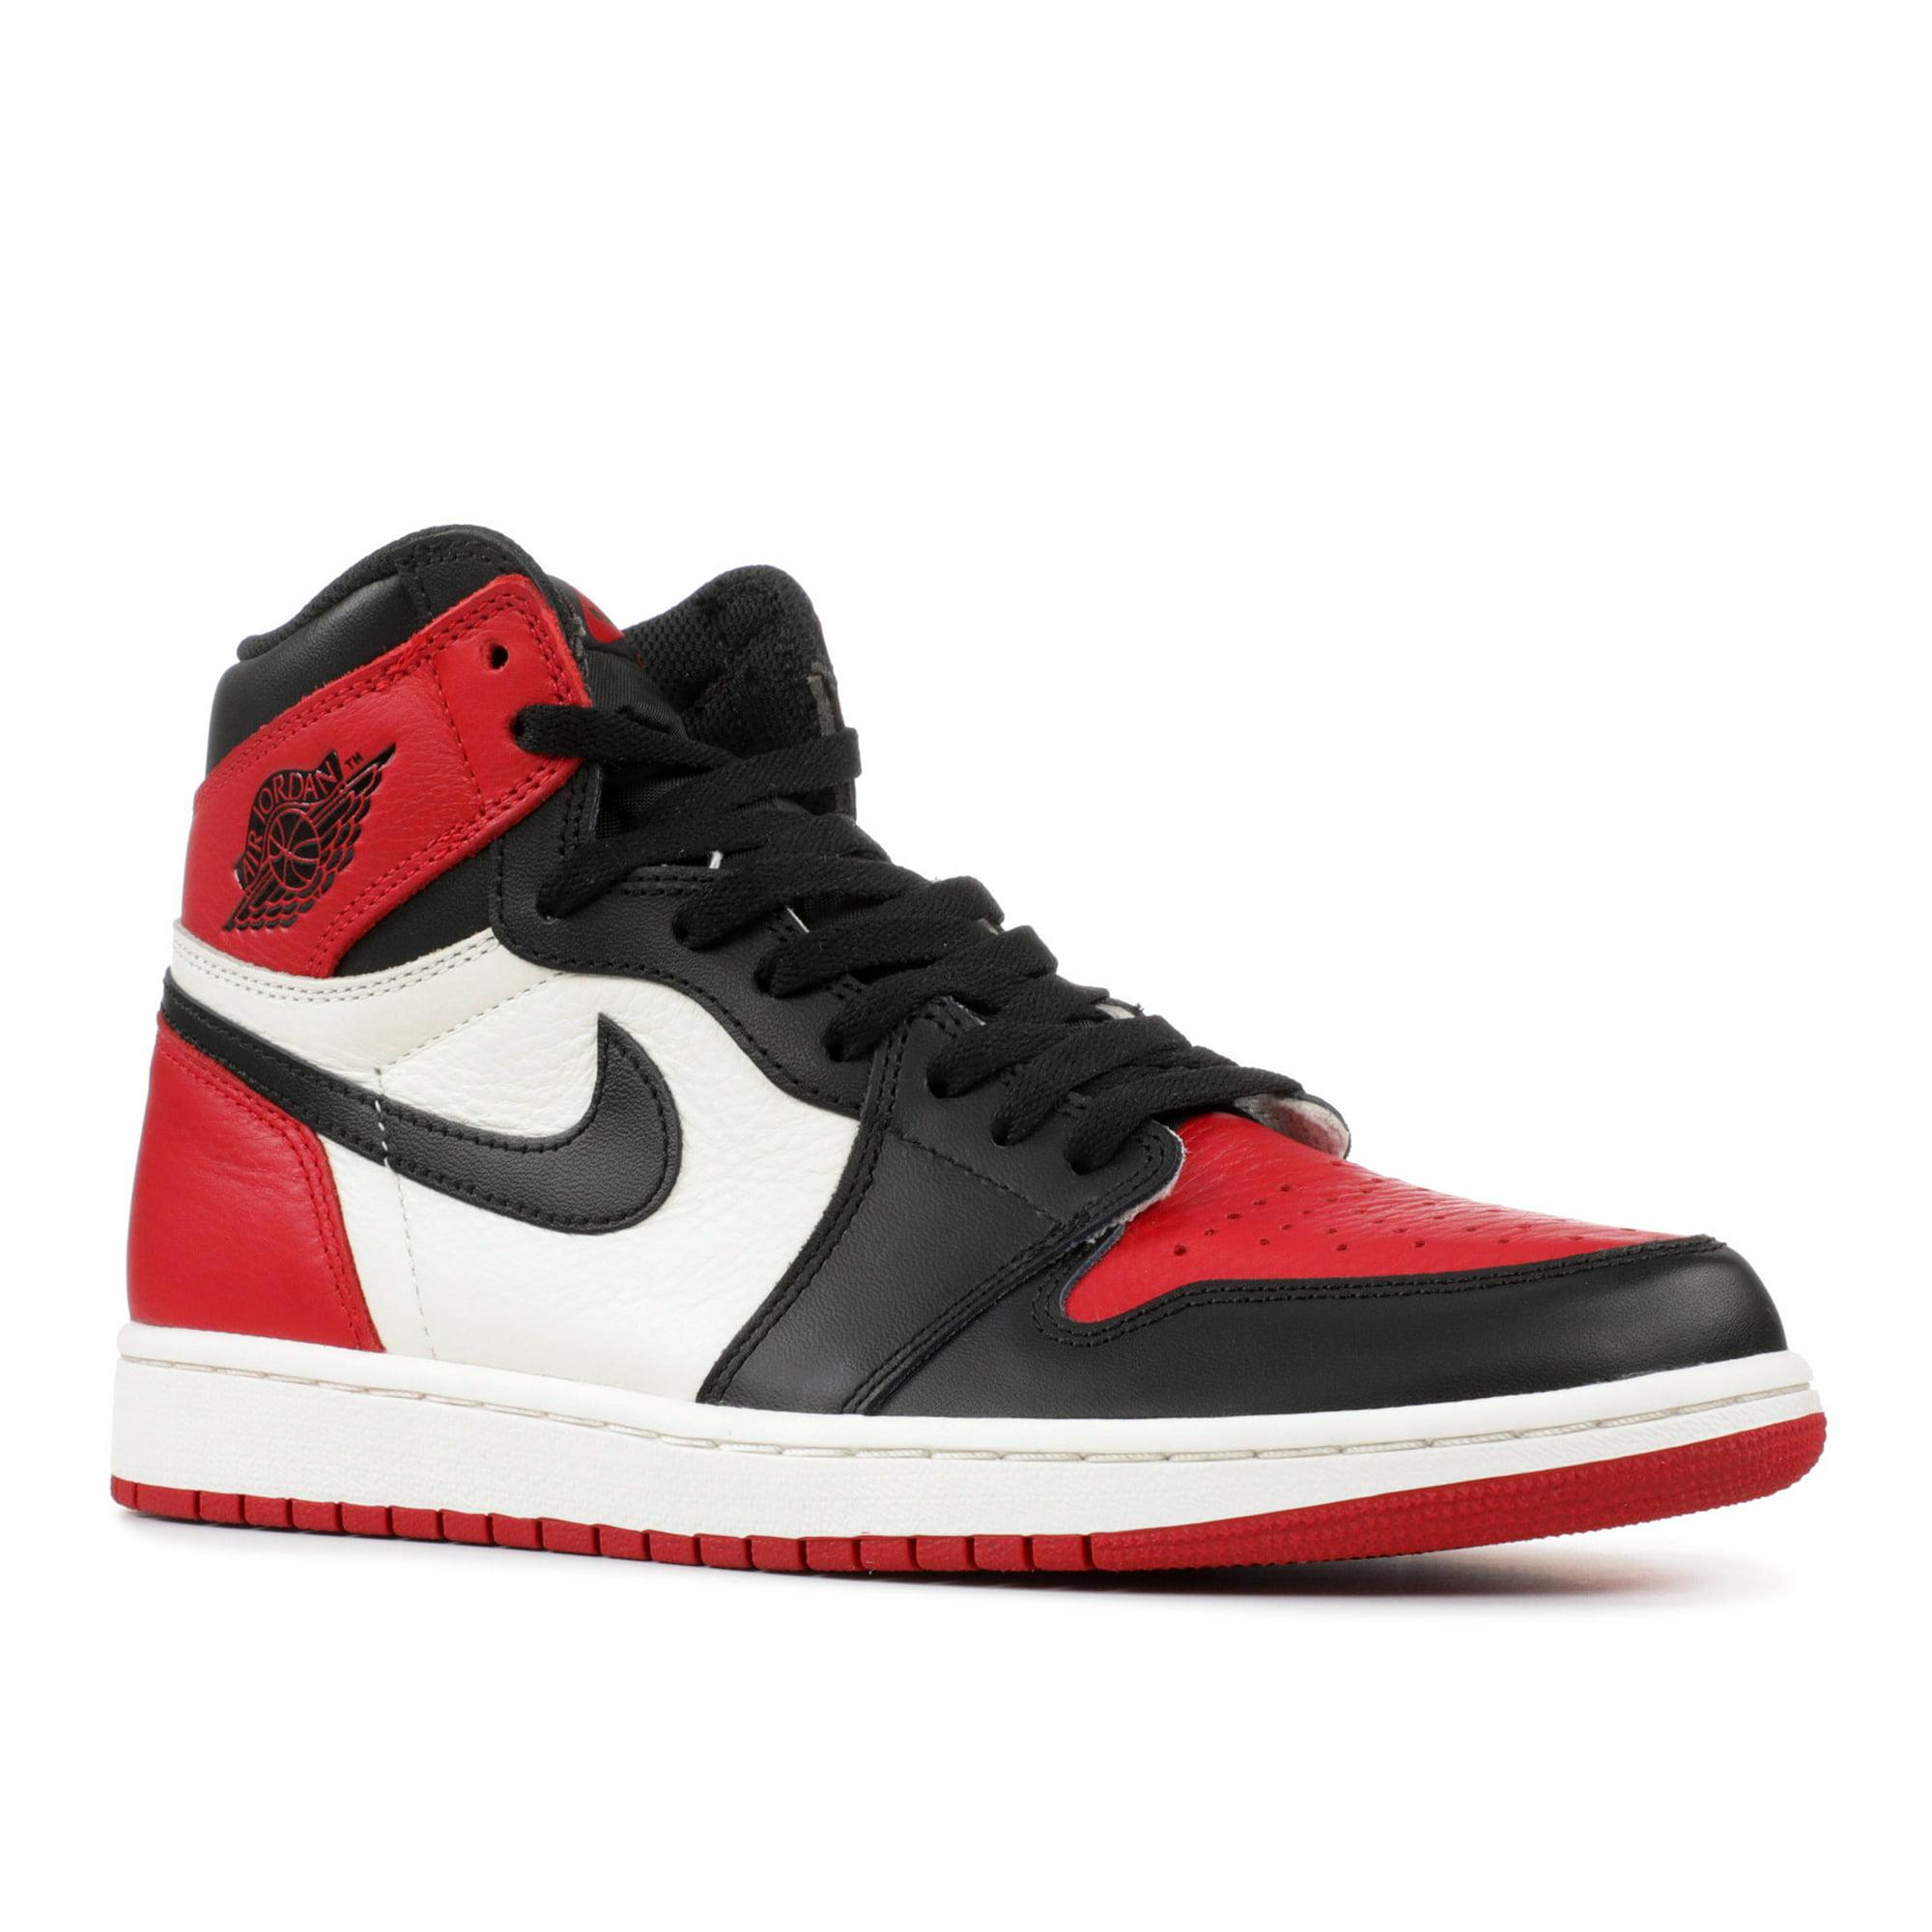 feb9ecd8e429c7 Air Jordan - Men - Air Jordan 1 Retro High Og  Bred Toe  - 555088-610 -  Size 16